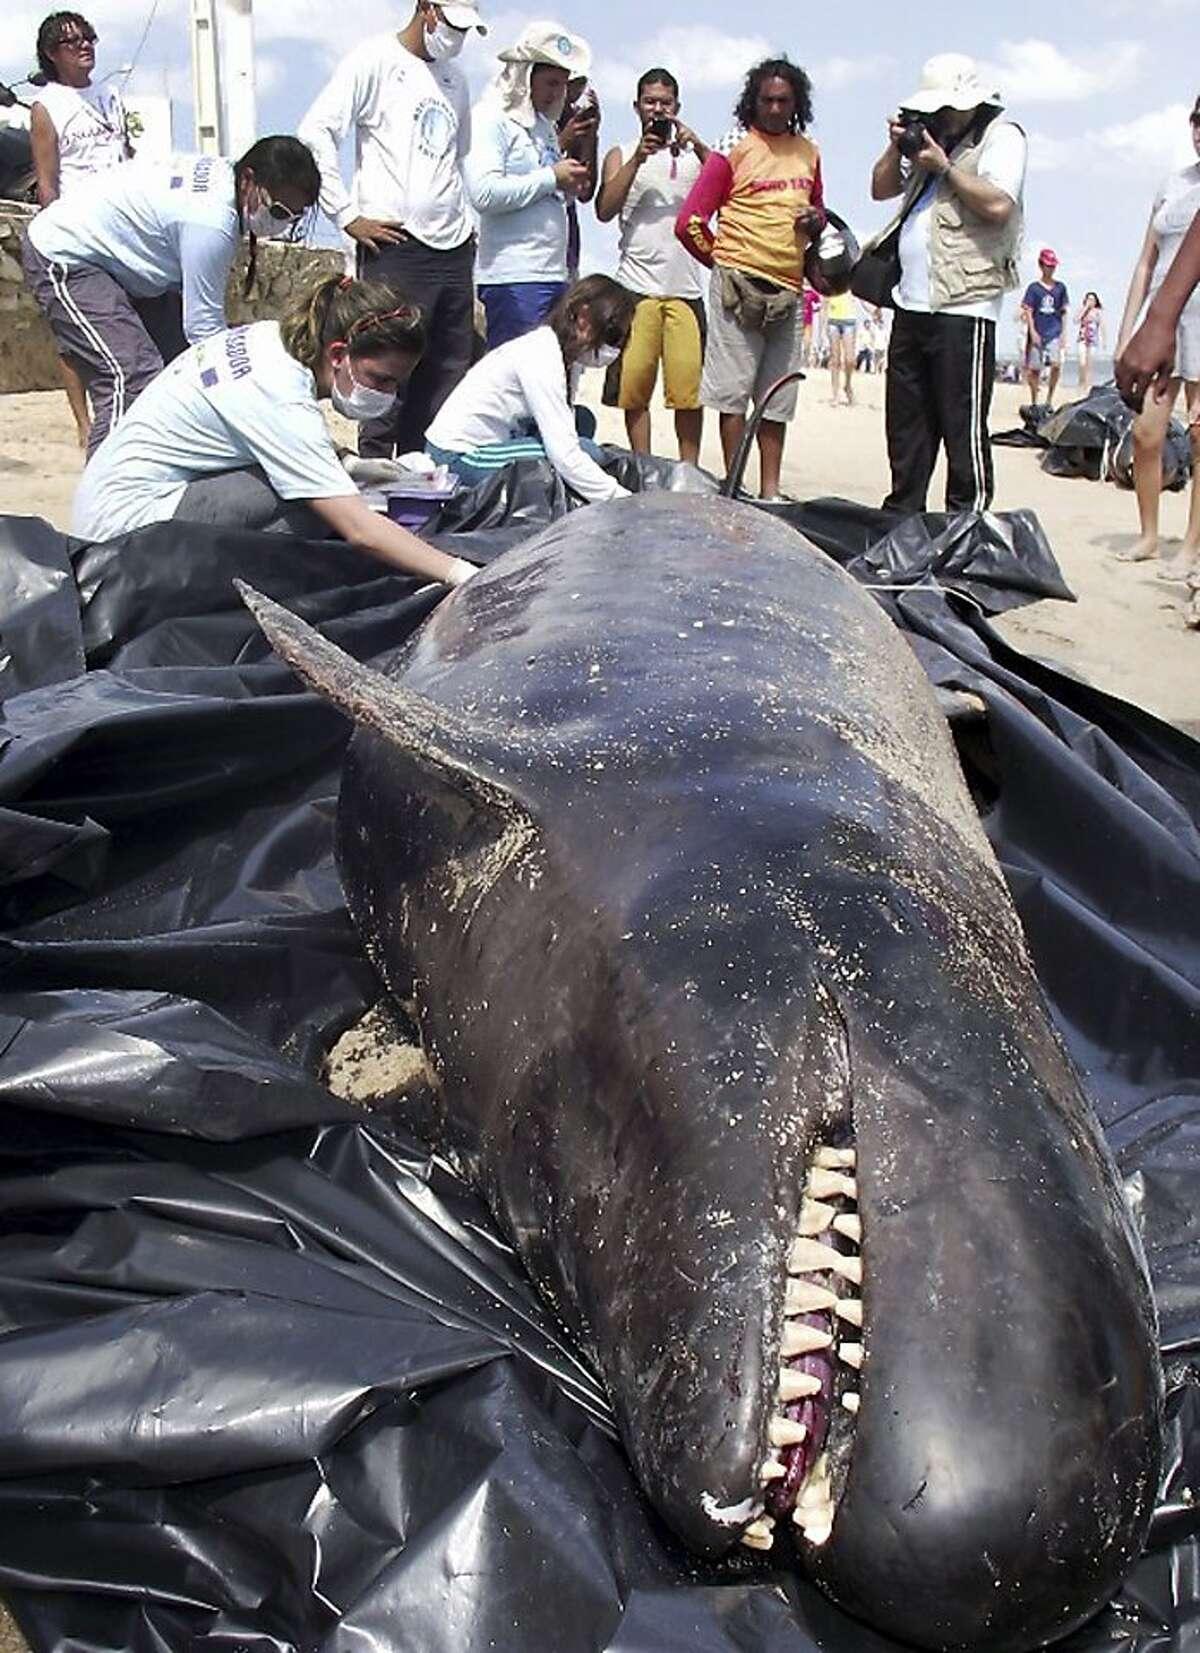 I said, 'eaaaaaaaasy big fella': Biologists inspect a dead dolphin on Upanema beach in the Areia Branca municipality of Rio Grande do Norte state, Brazil.